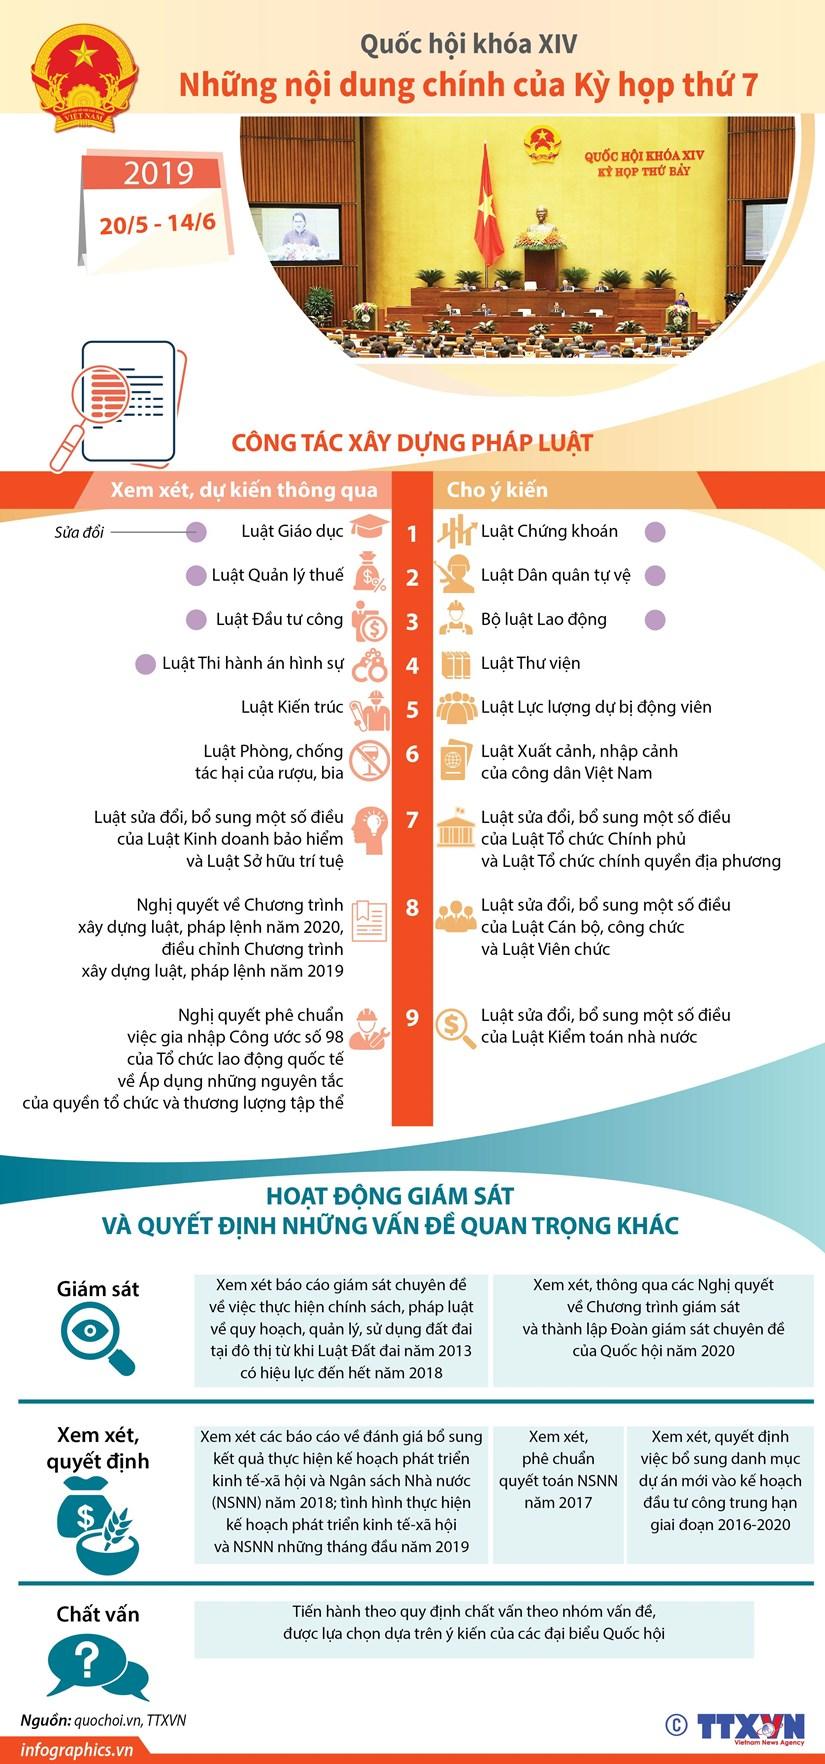 [Infographics] Noi dung chinh cua Ky hop thu 7, Quoc hoi khoa XIV hinh anh 1